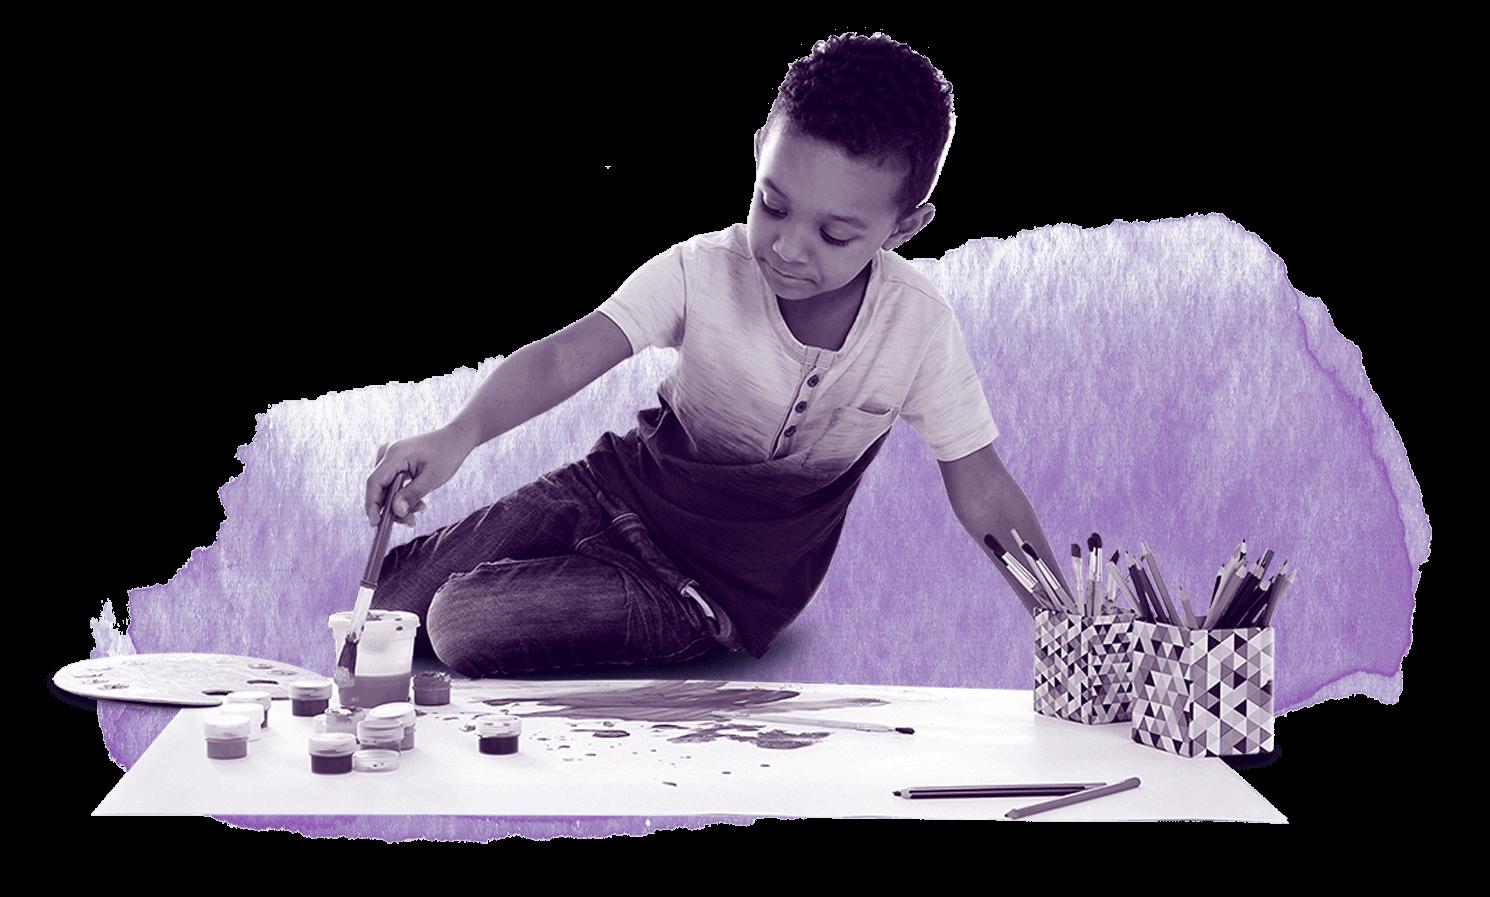 creative boy painting